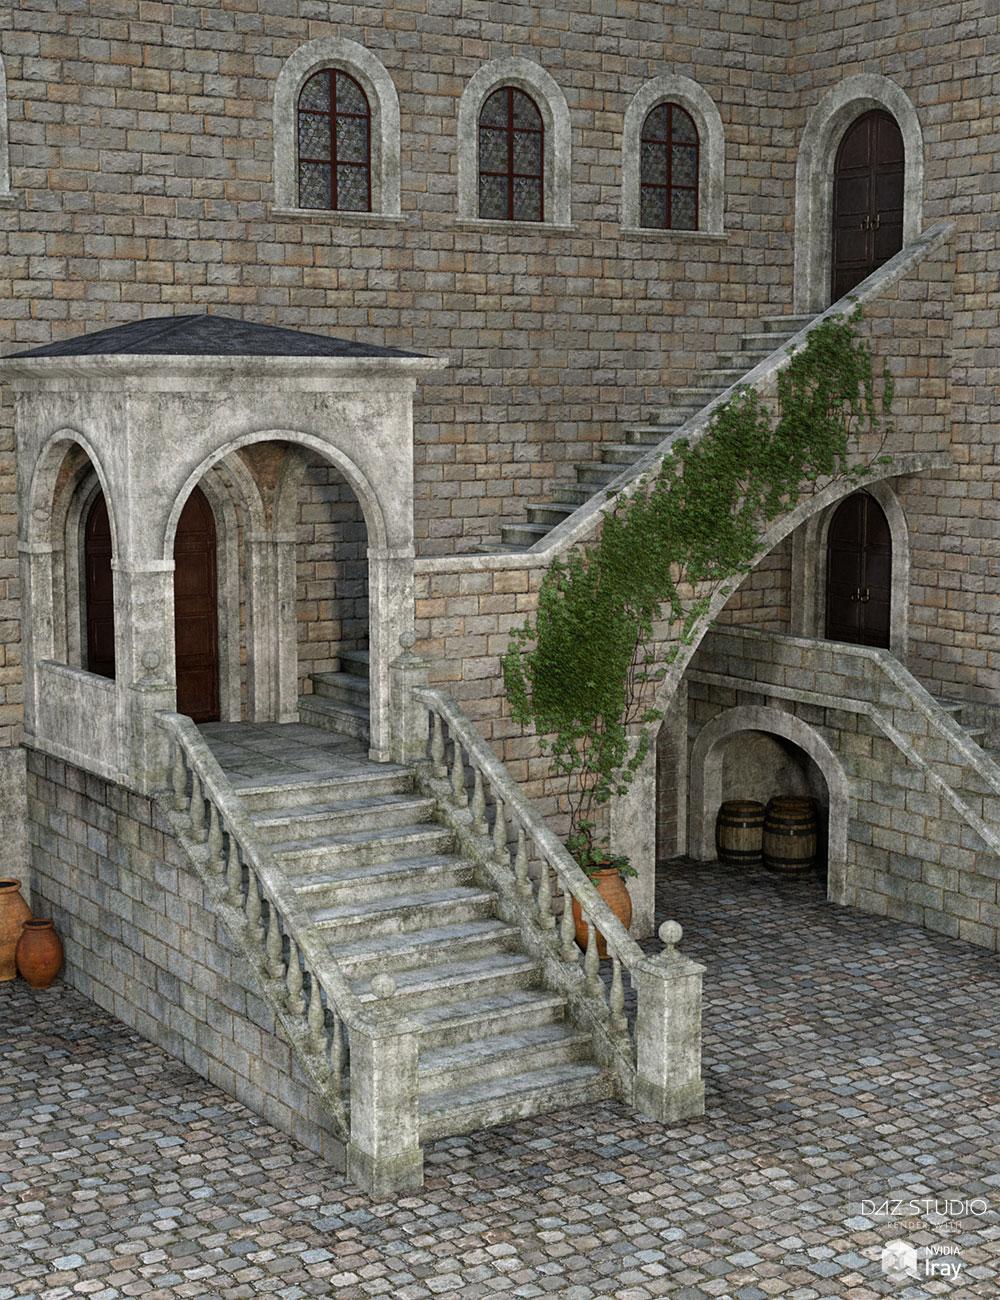 DM's Courtyard by: Daniemarforno, 3D Models by Daz 3D